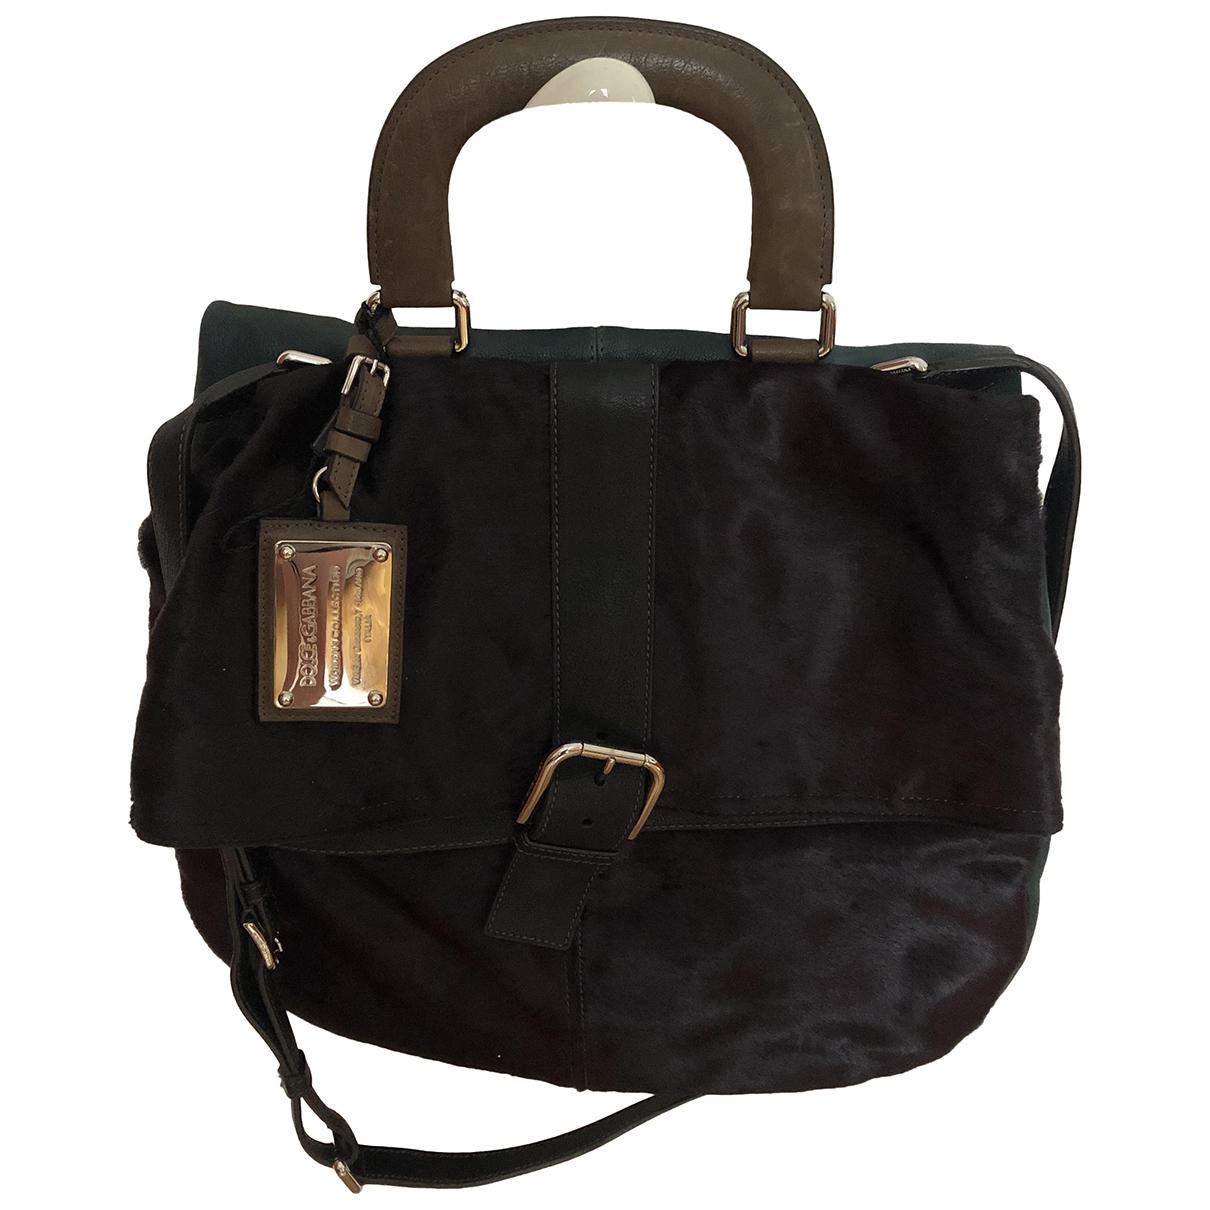 Dolce & Gabbana \N Handtasche in  Blau Kalbsleder in Pony-Optik